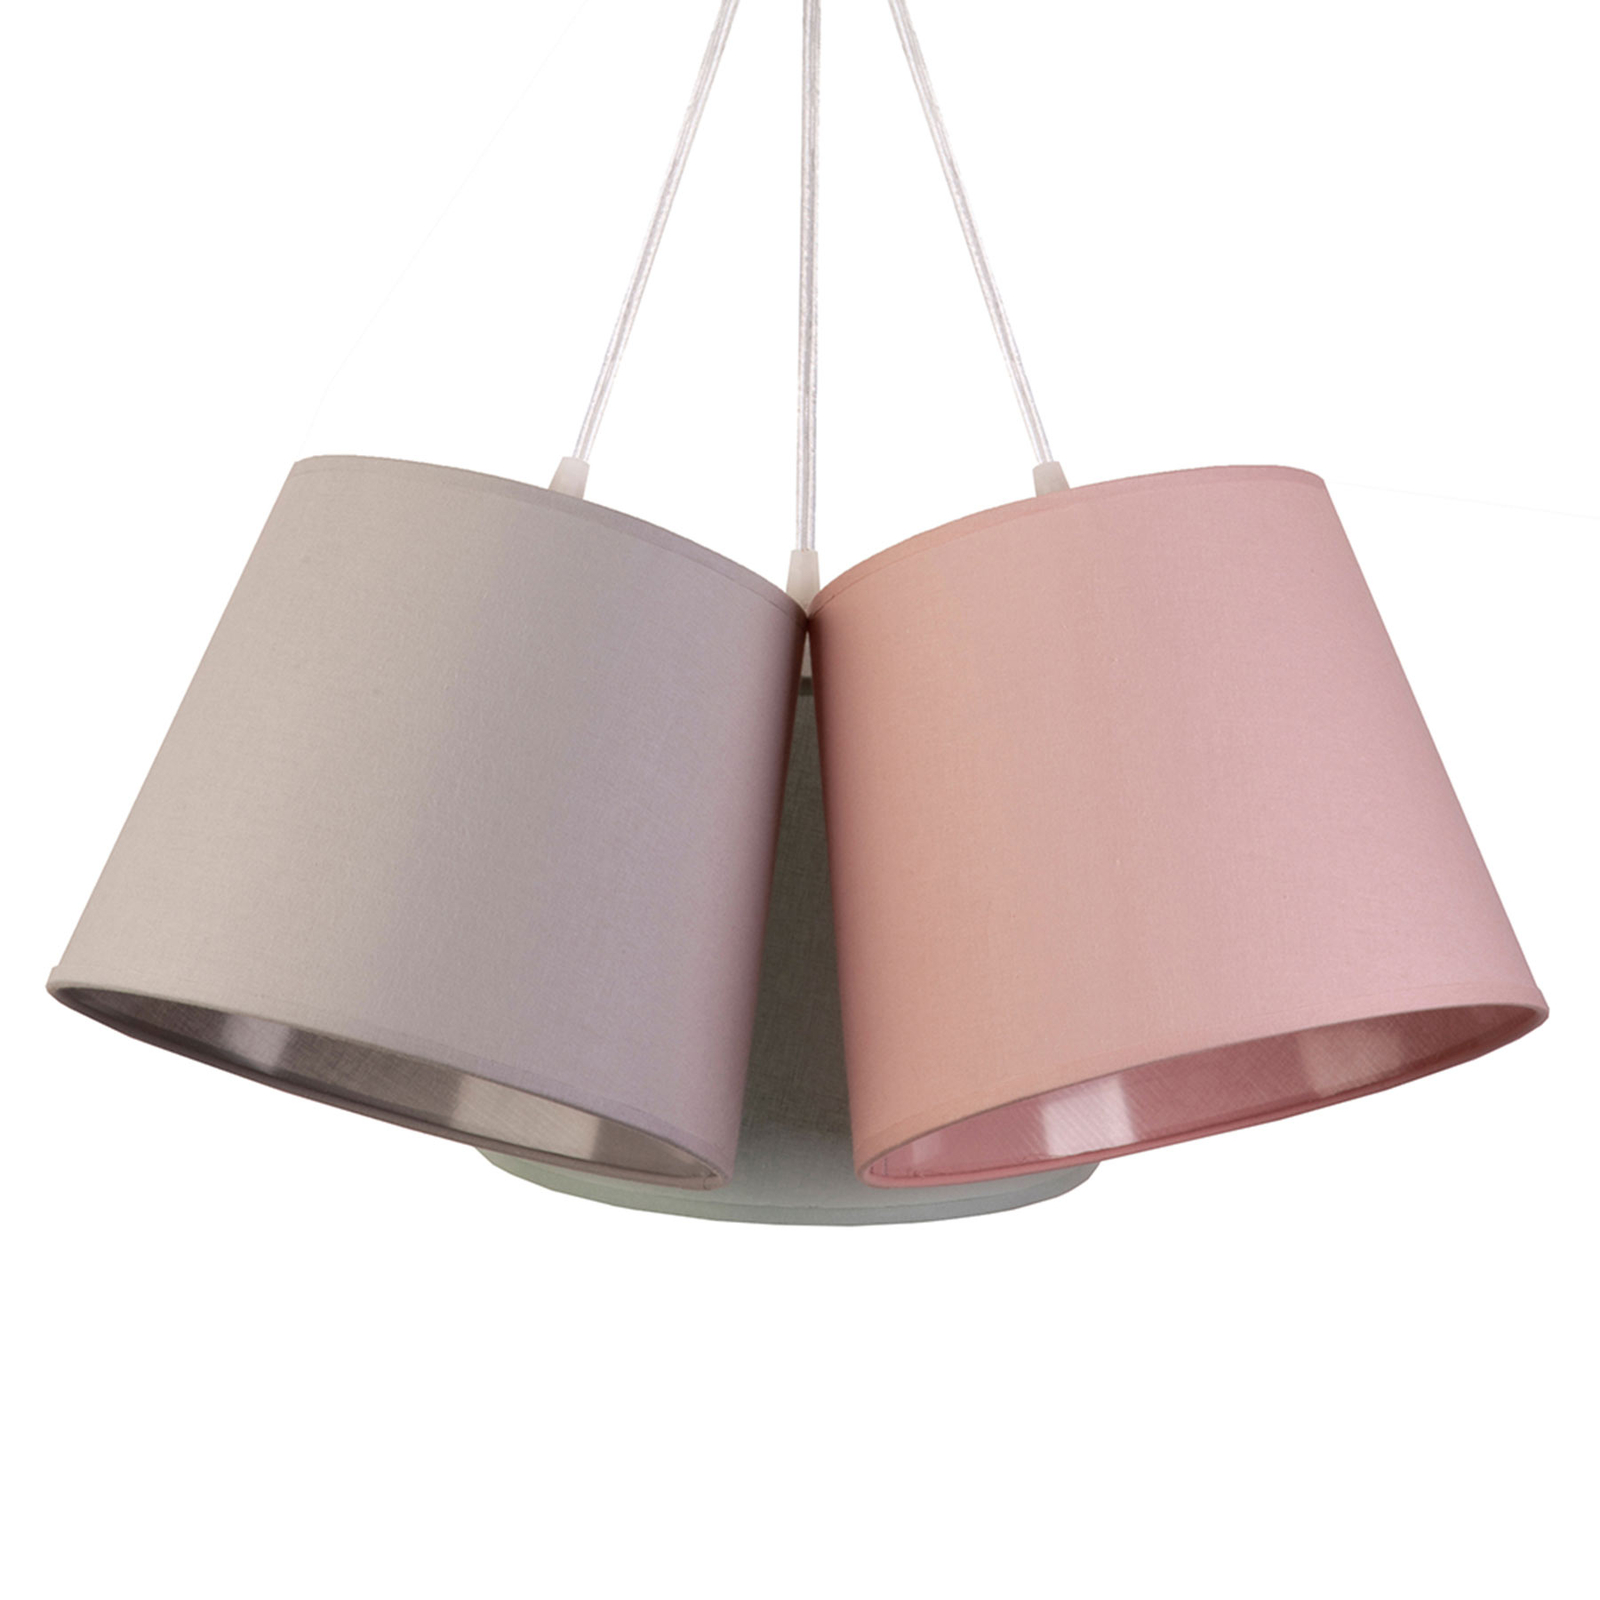 Suspension Rossa à 3 lampes, grise/rose